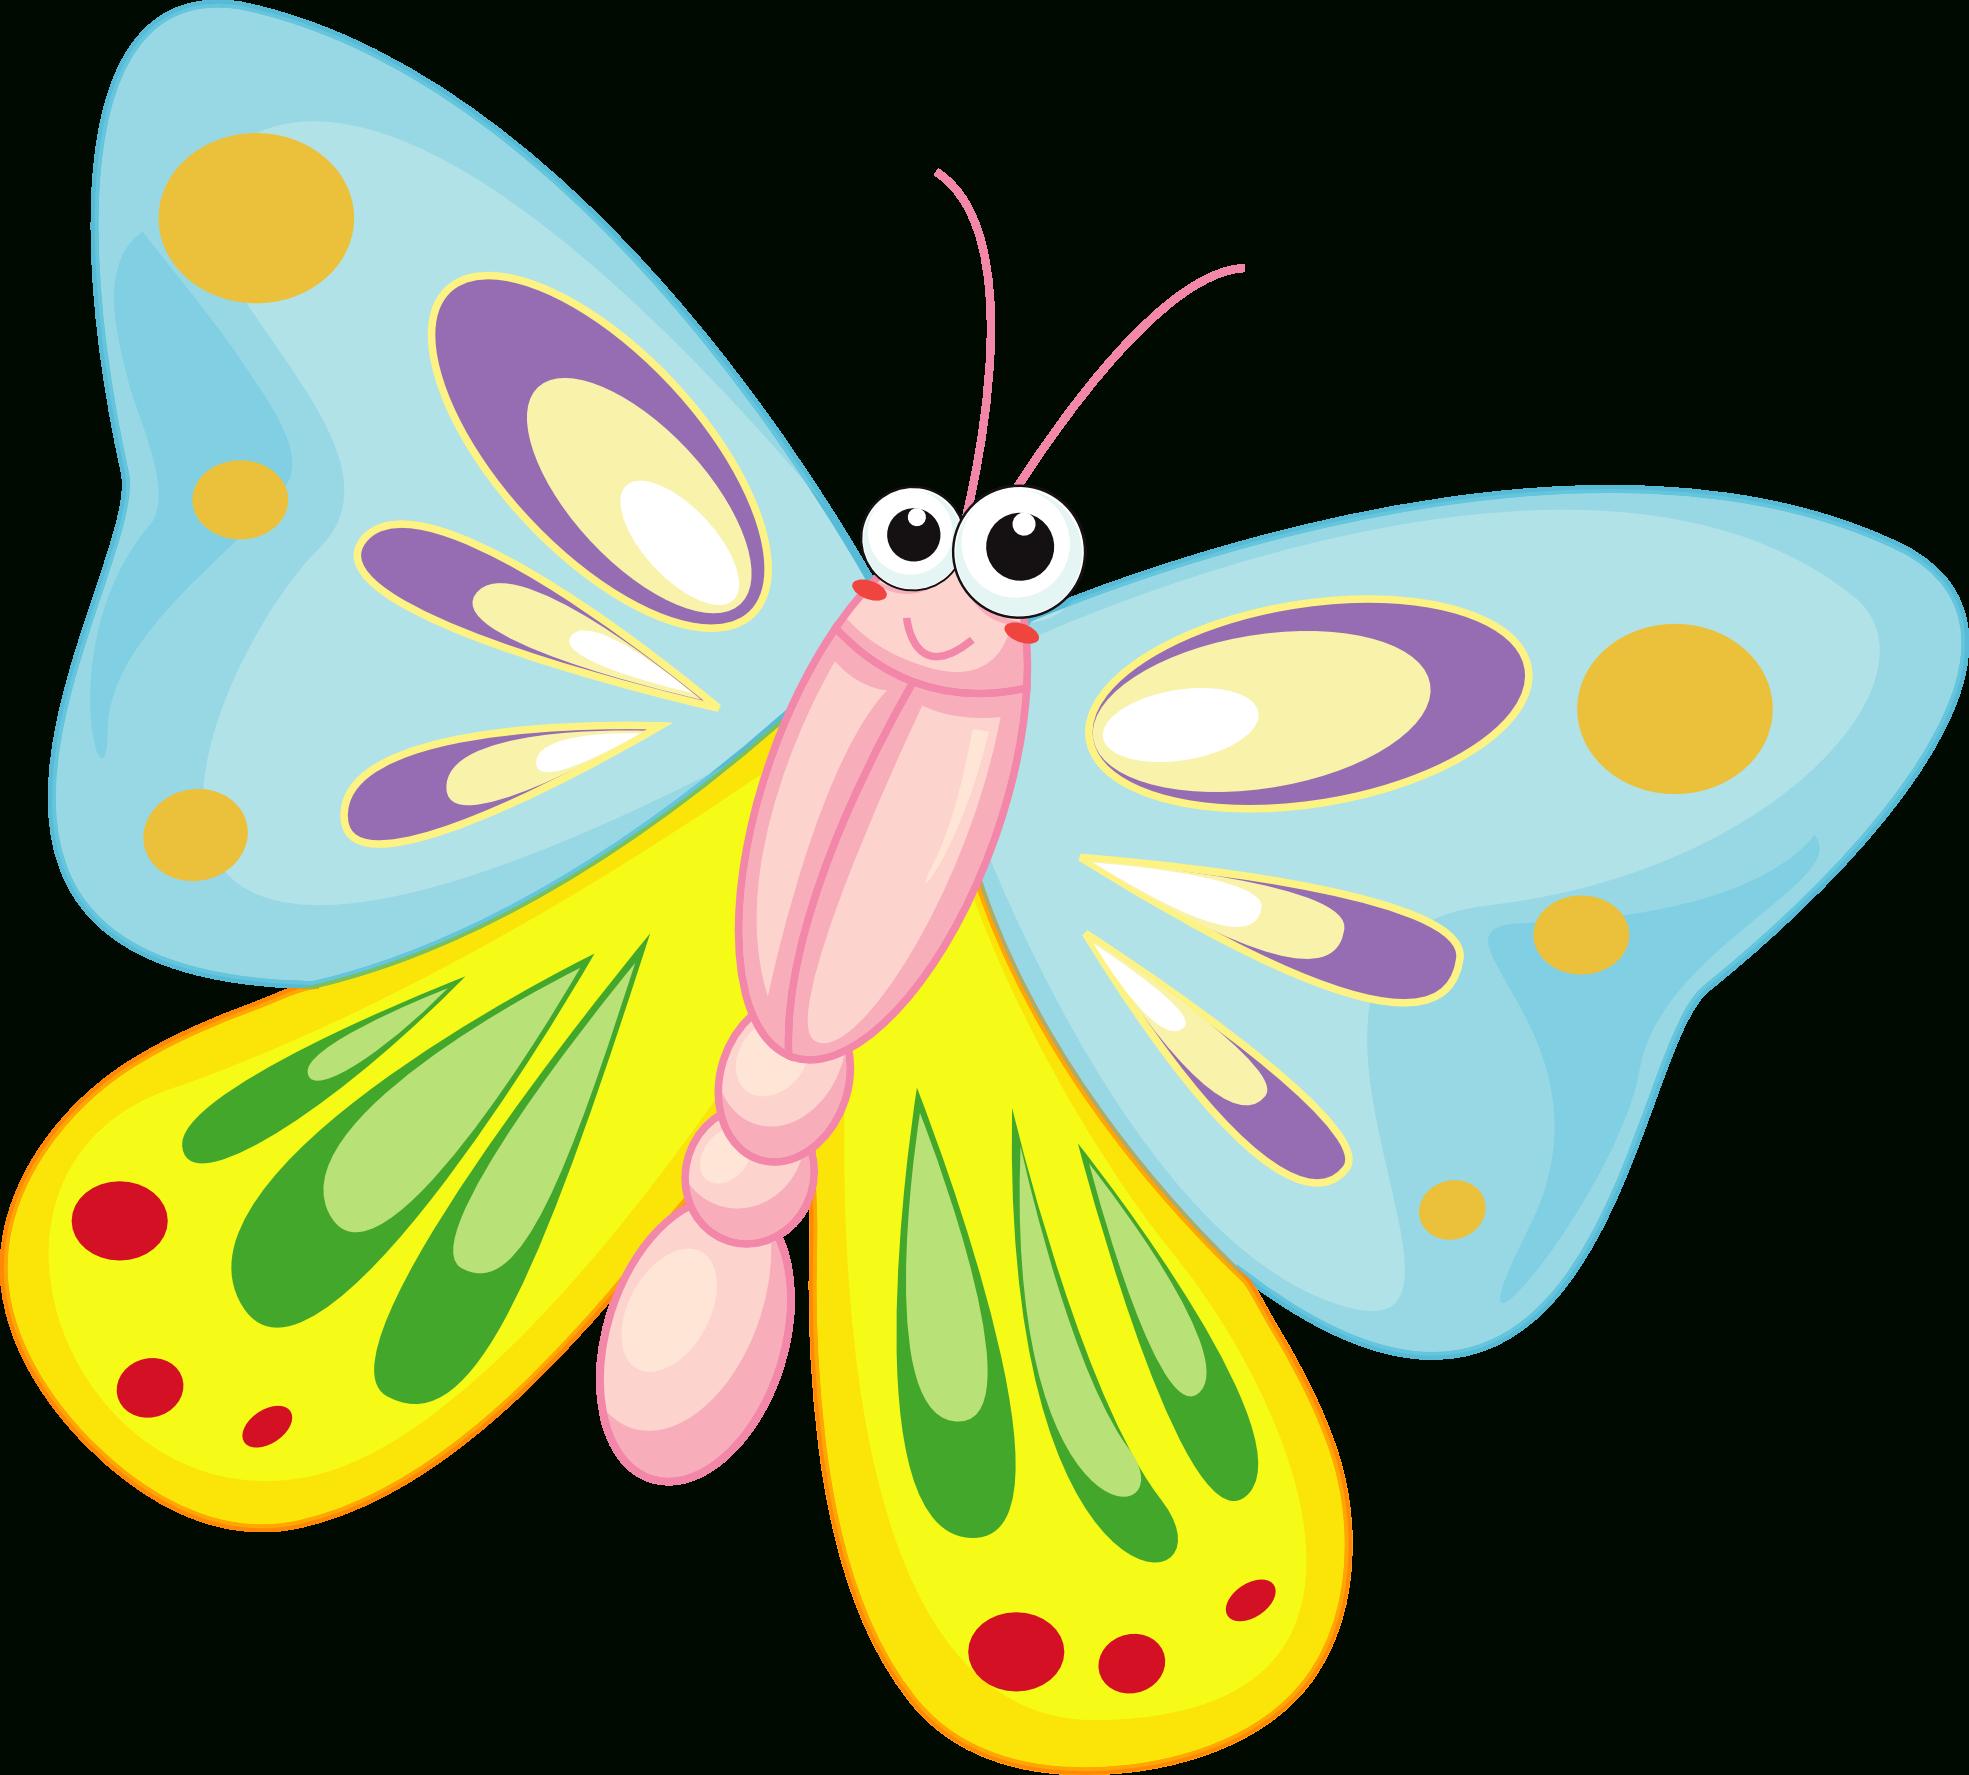 Free Butterfly Cartoon, Download Free Clip Art, Free Clip Art On - Free Printable Butterfly Clipart